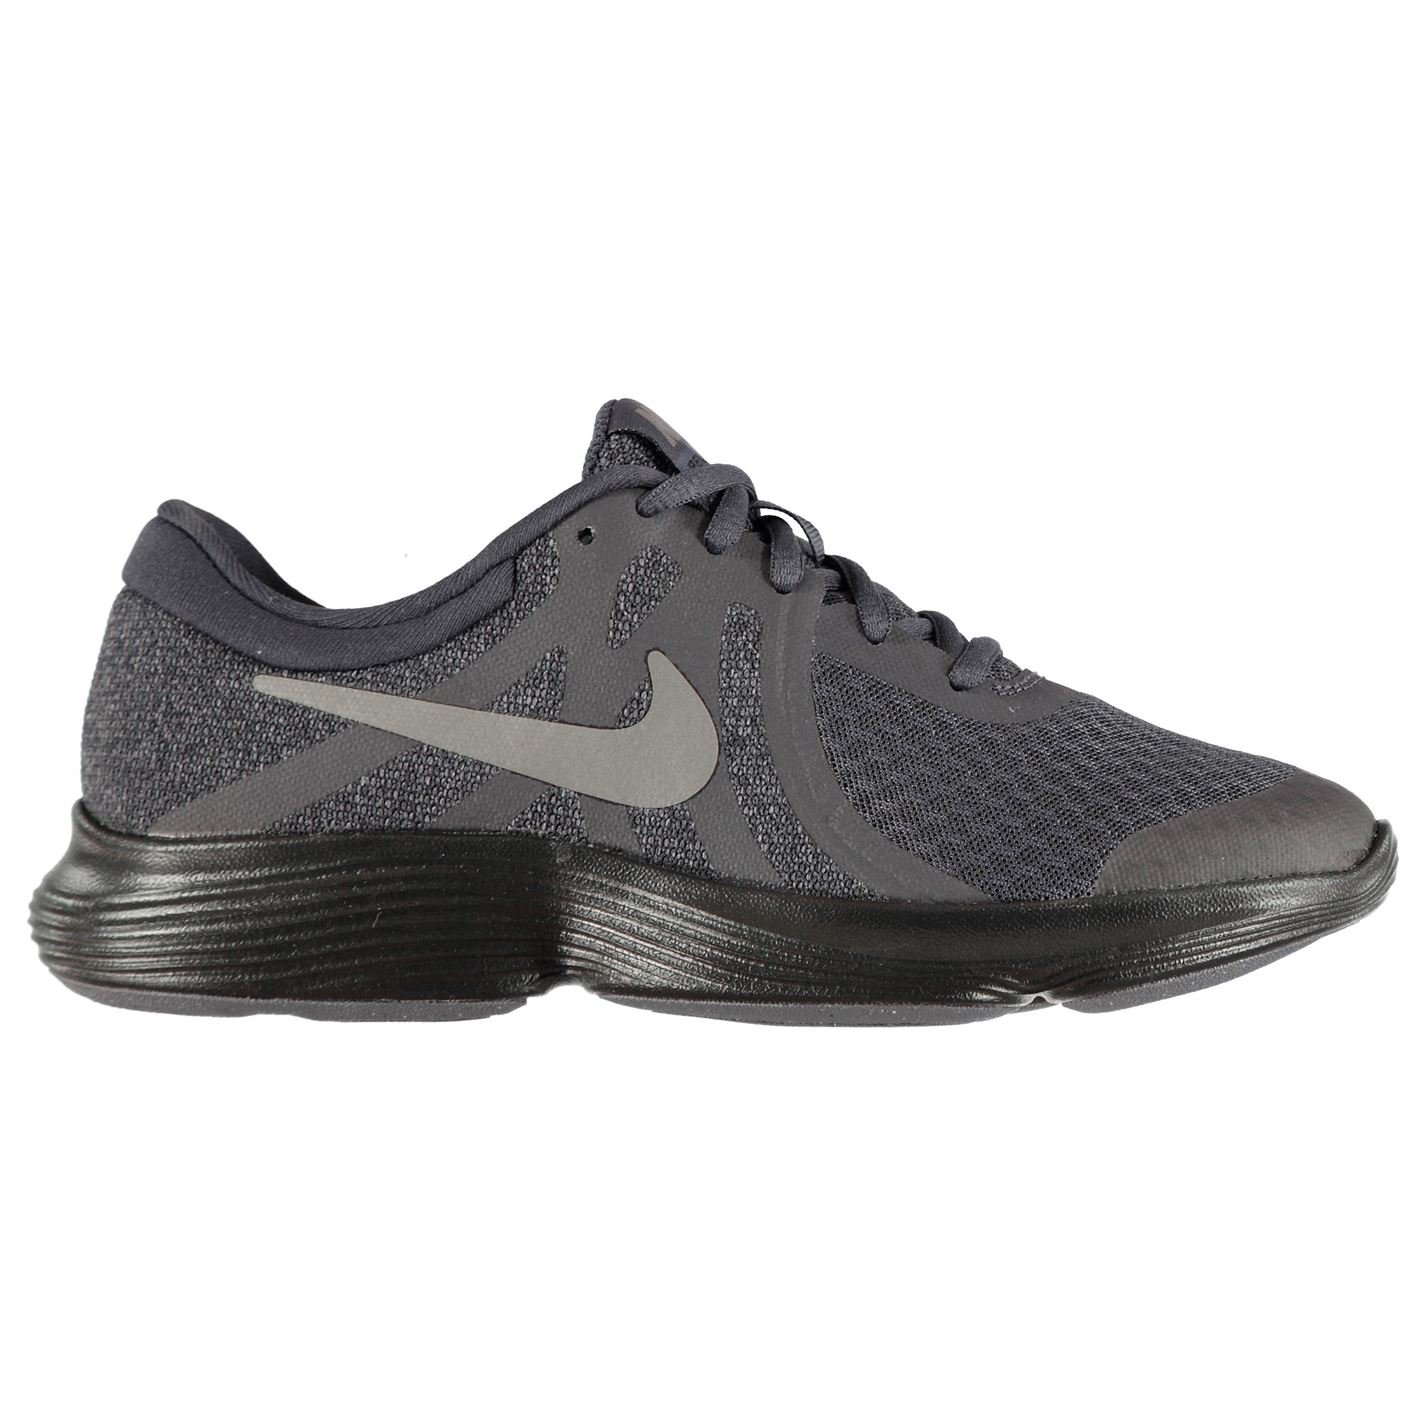 Nike Revolution 4 Tenisky Chlapecké boty - Glami.cz 3c299e3729